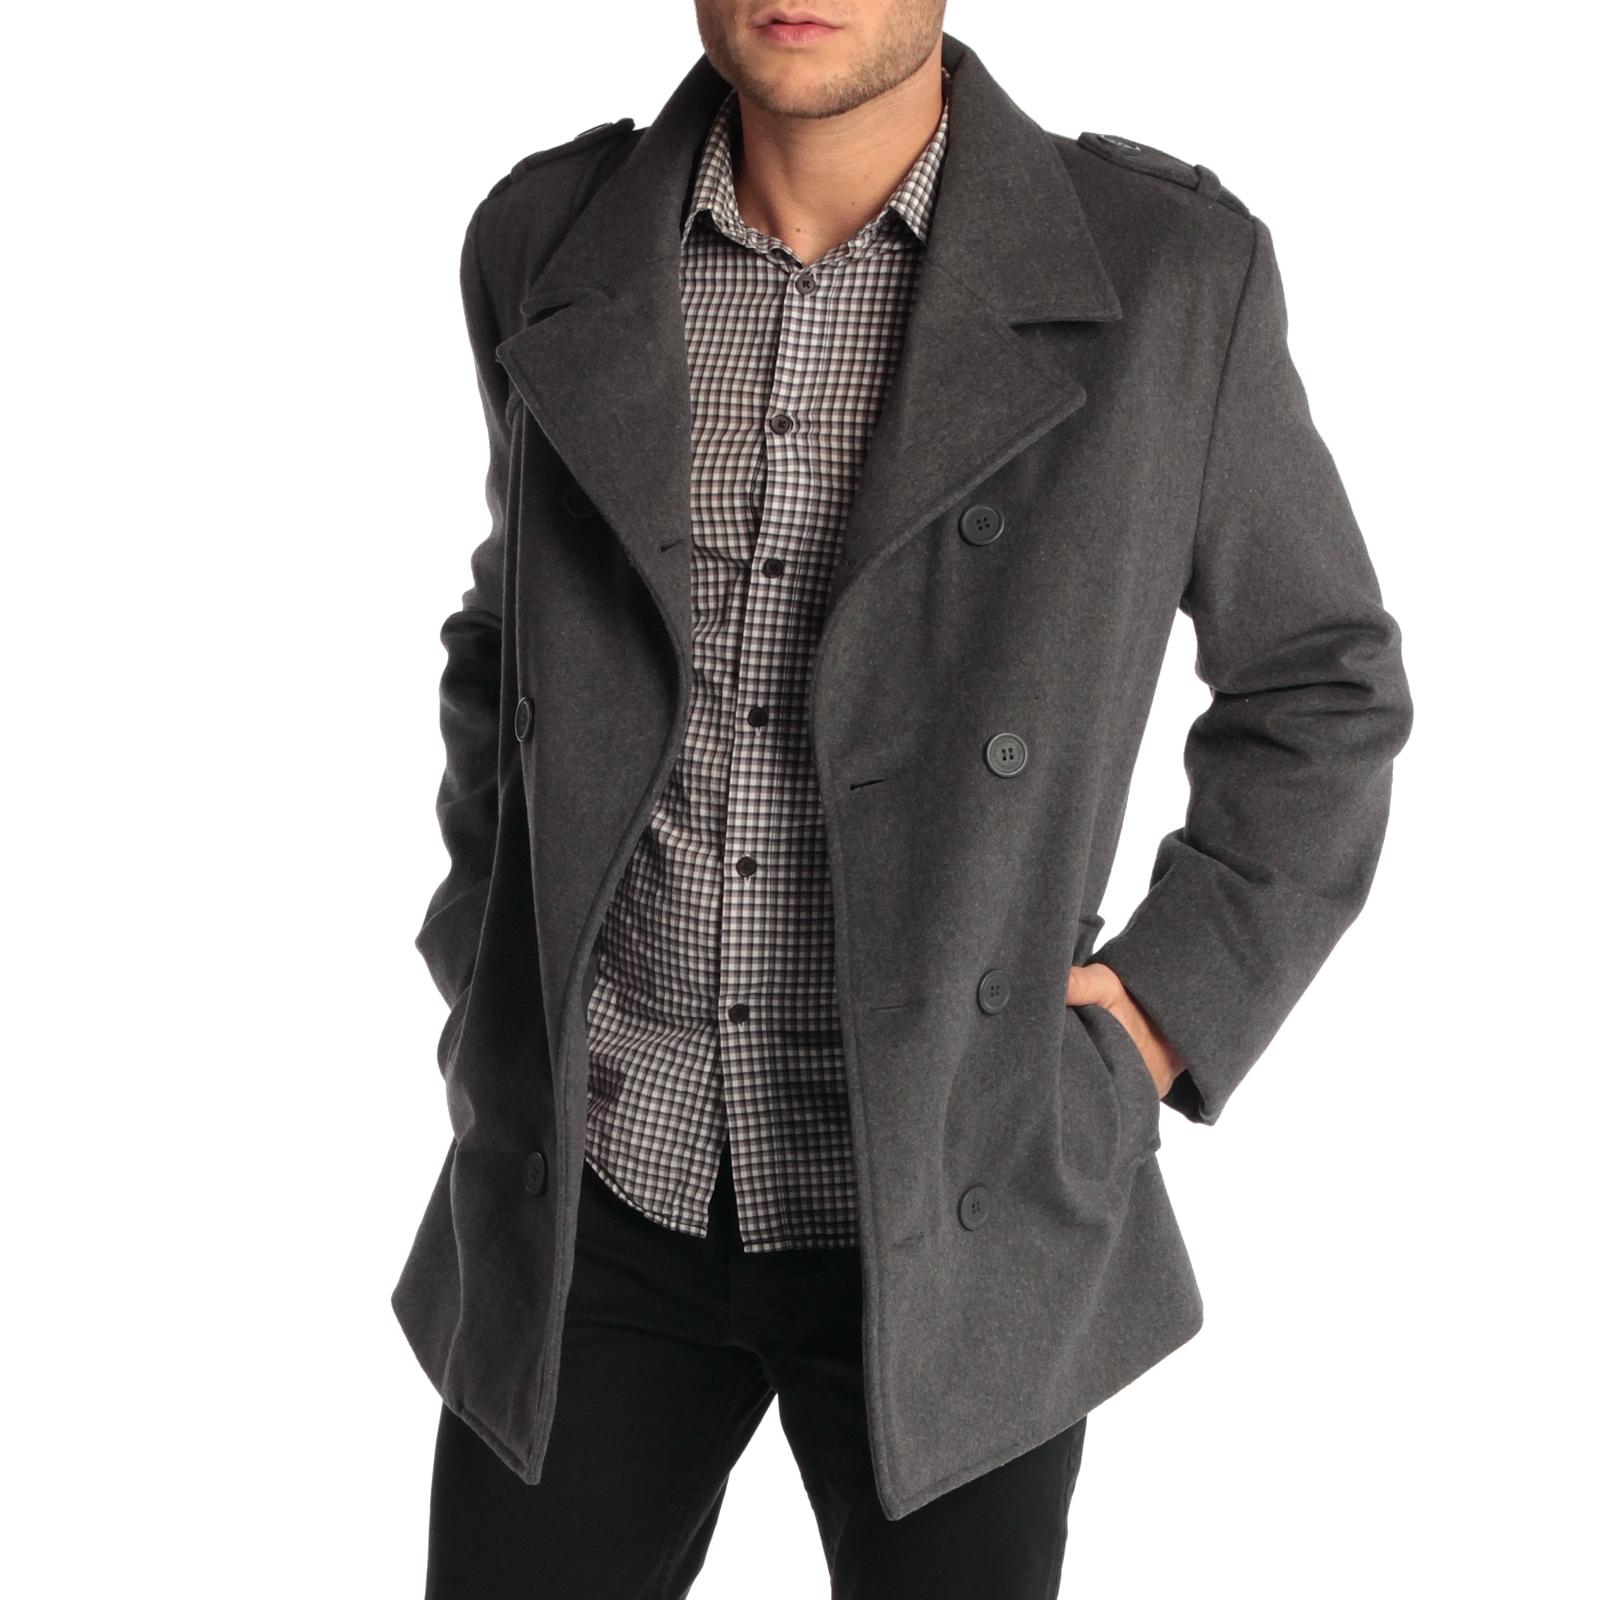 mens pea coats alpine-swiss-jake-mens-pea-coat-wool-blend- xdznenz